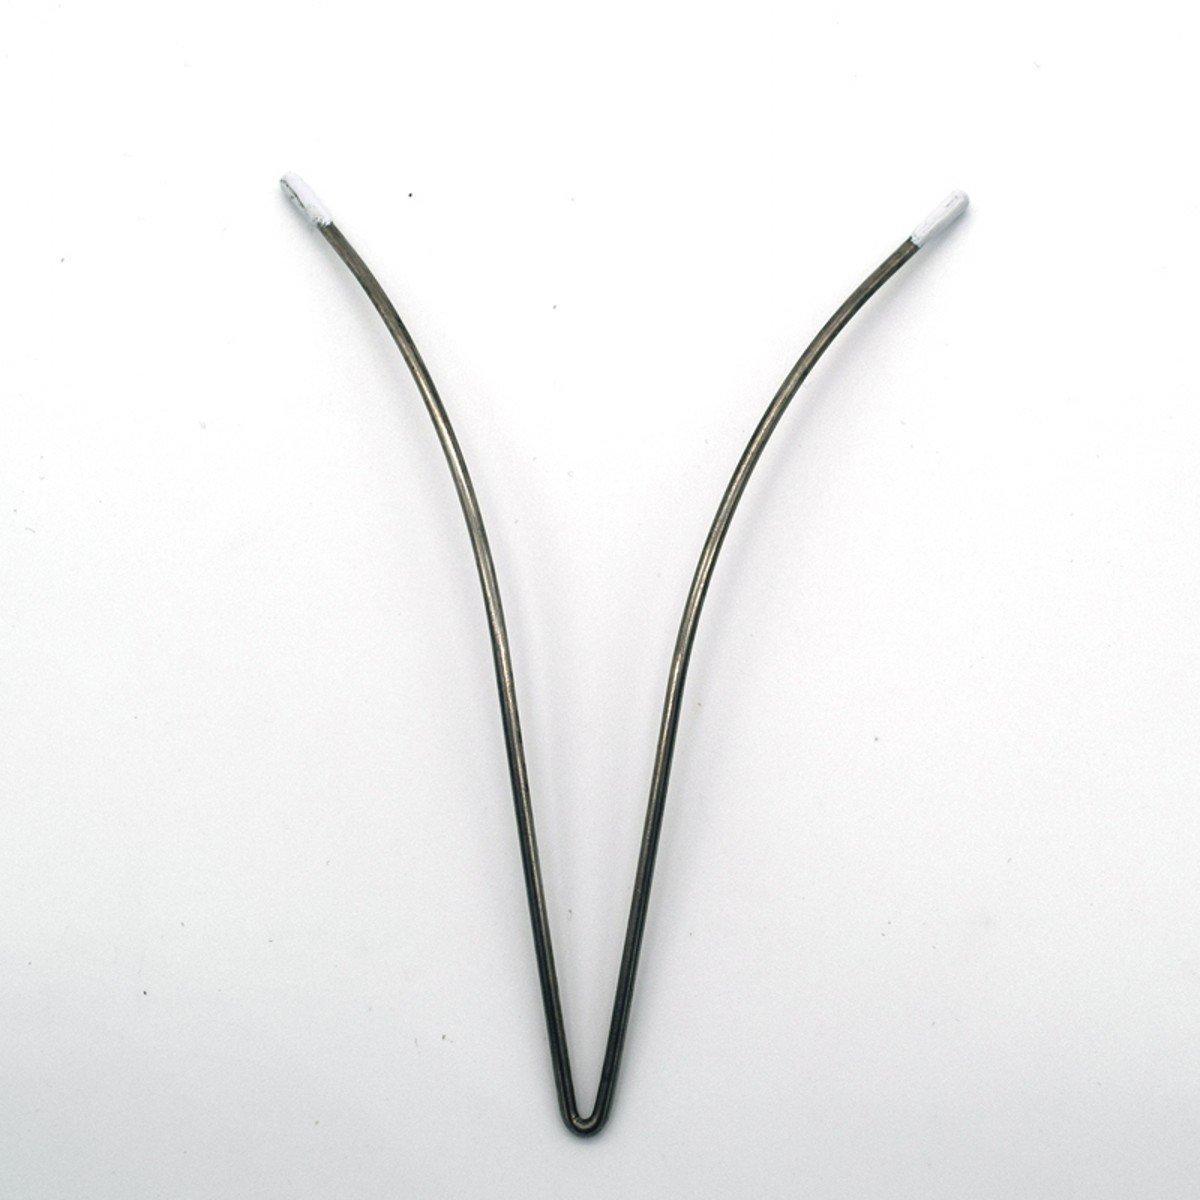 3PCS V Wires for Bra Corset ,Bra Corset Accessories,Bra Making